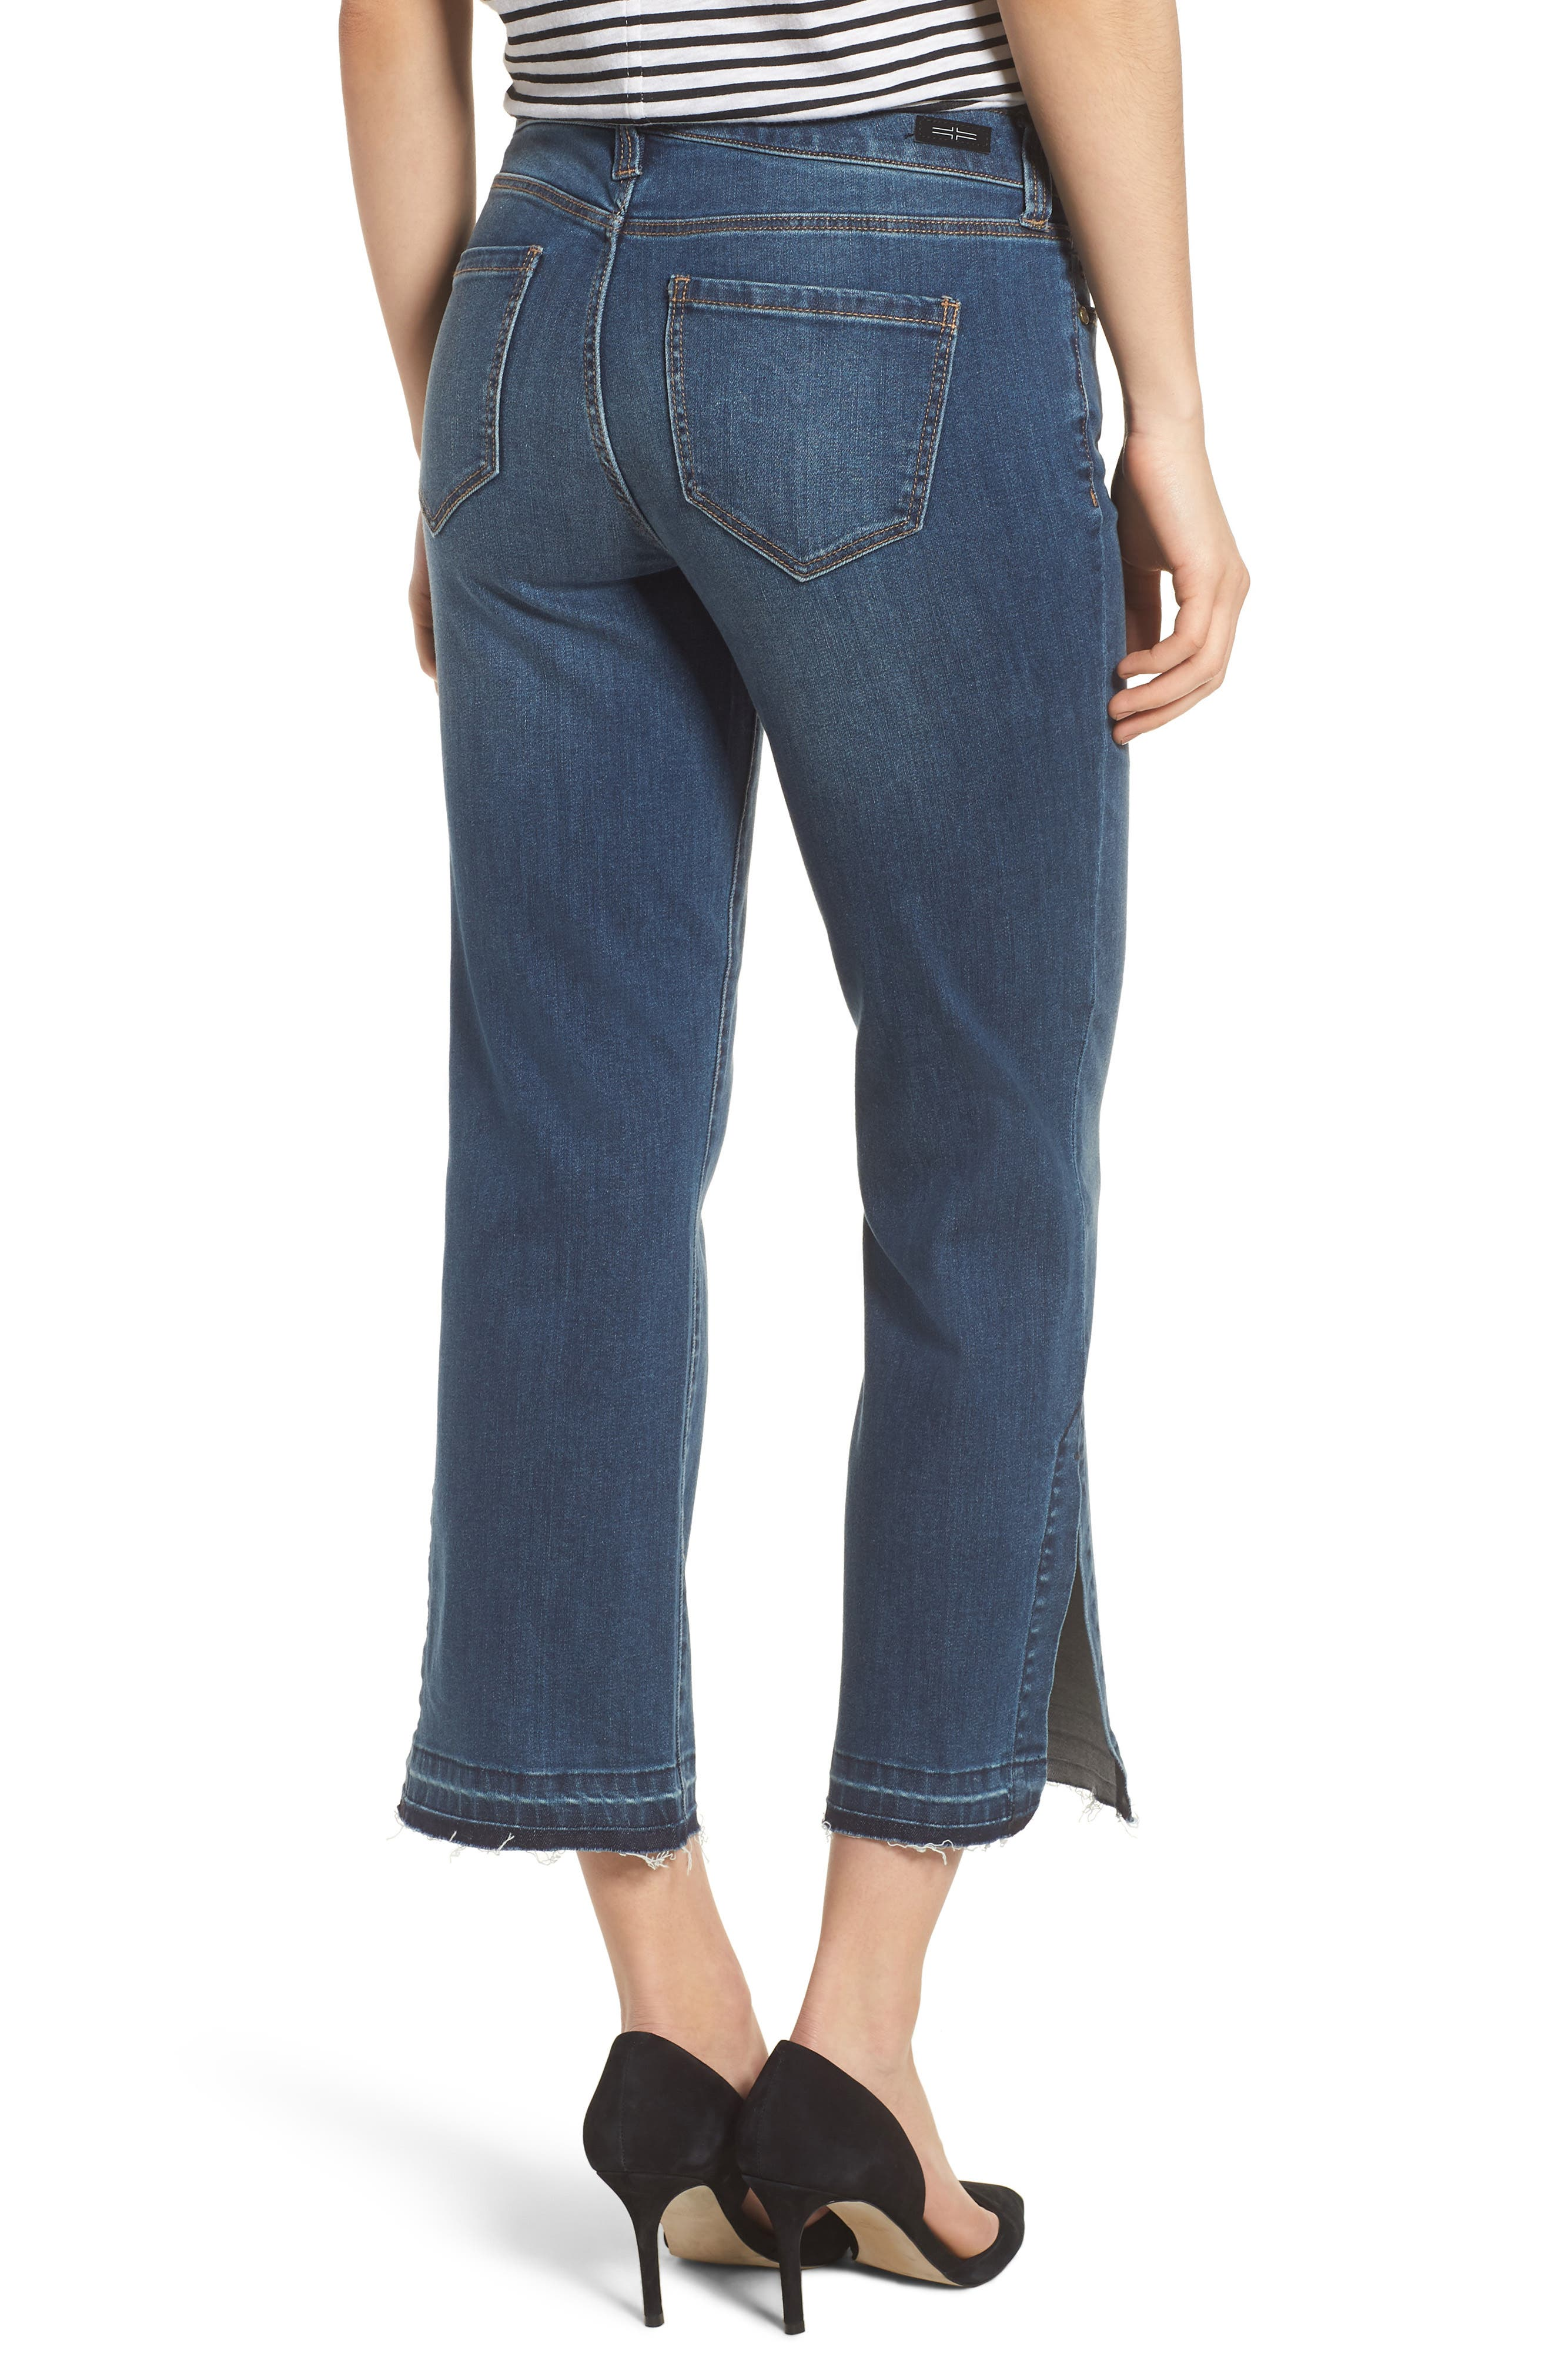 Tabitha Release Hem Crop Jeans,                             Alternate thumbnail 2, color,                             Montauk Mid Blue